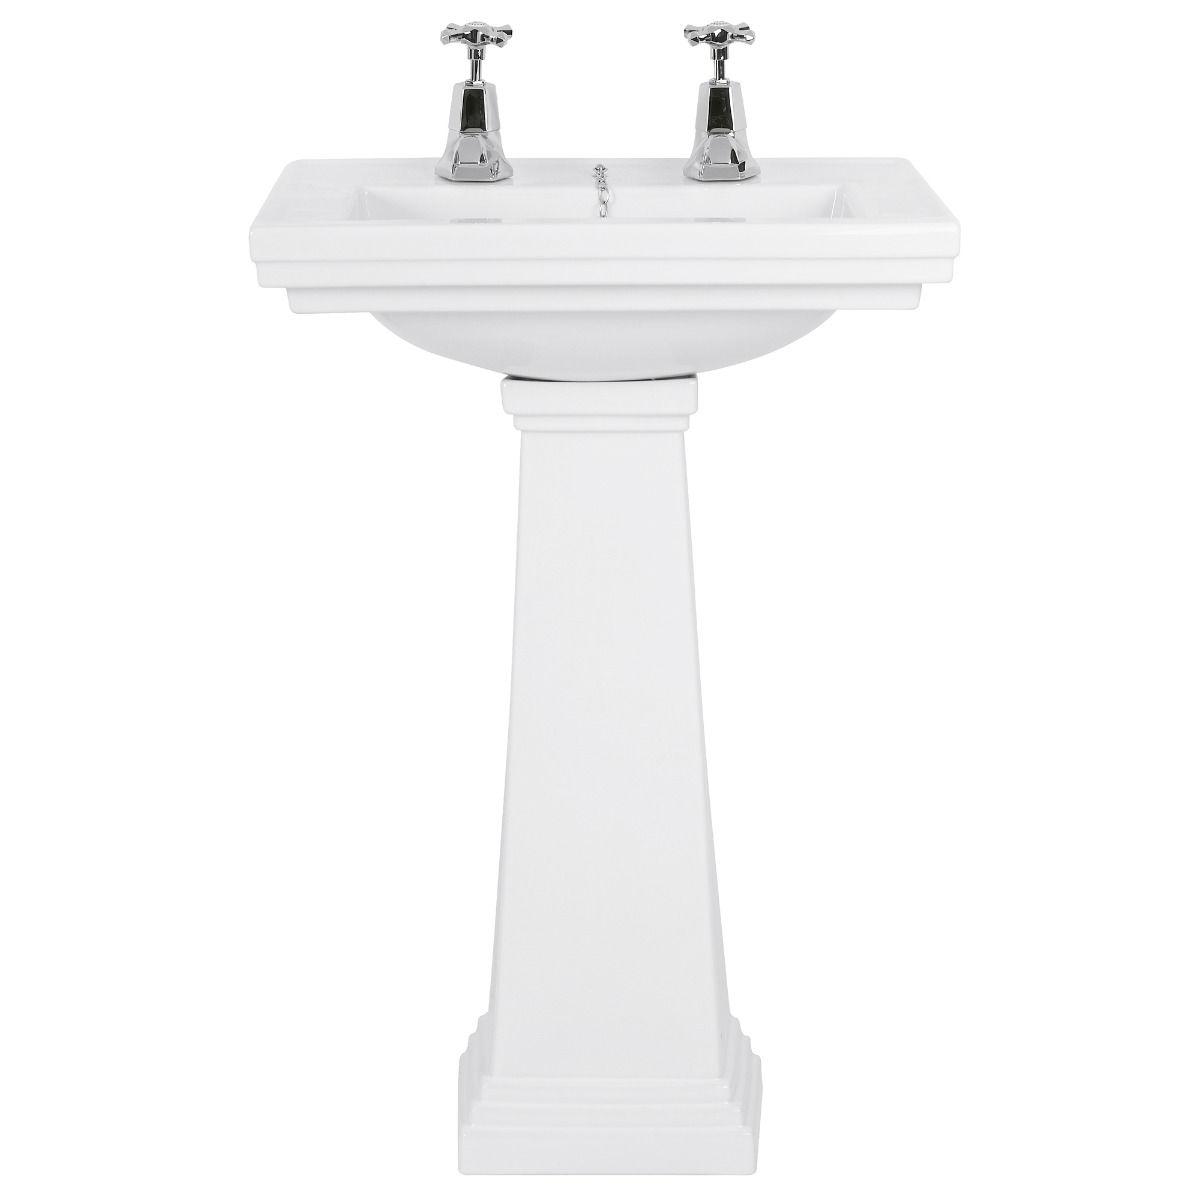 Battersea Cloakroom Basin and Pedestal